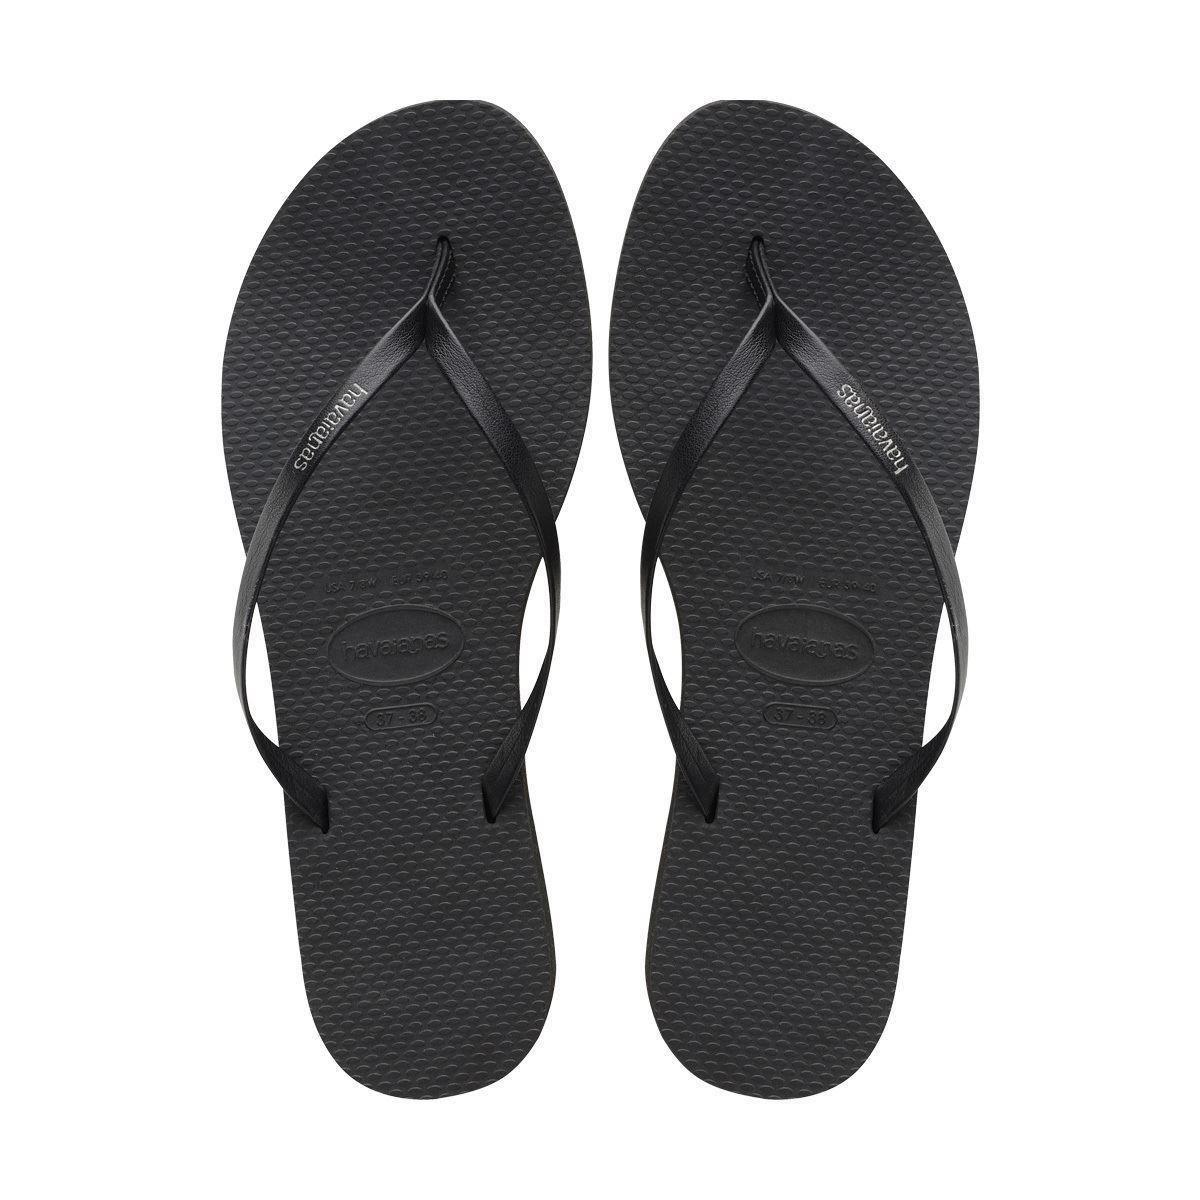 havaianas brazil you metallic flip flops summer sandals. Black Bedroom Furniture Sets. Home Design Ideas